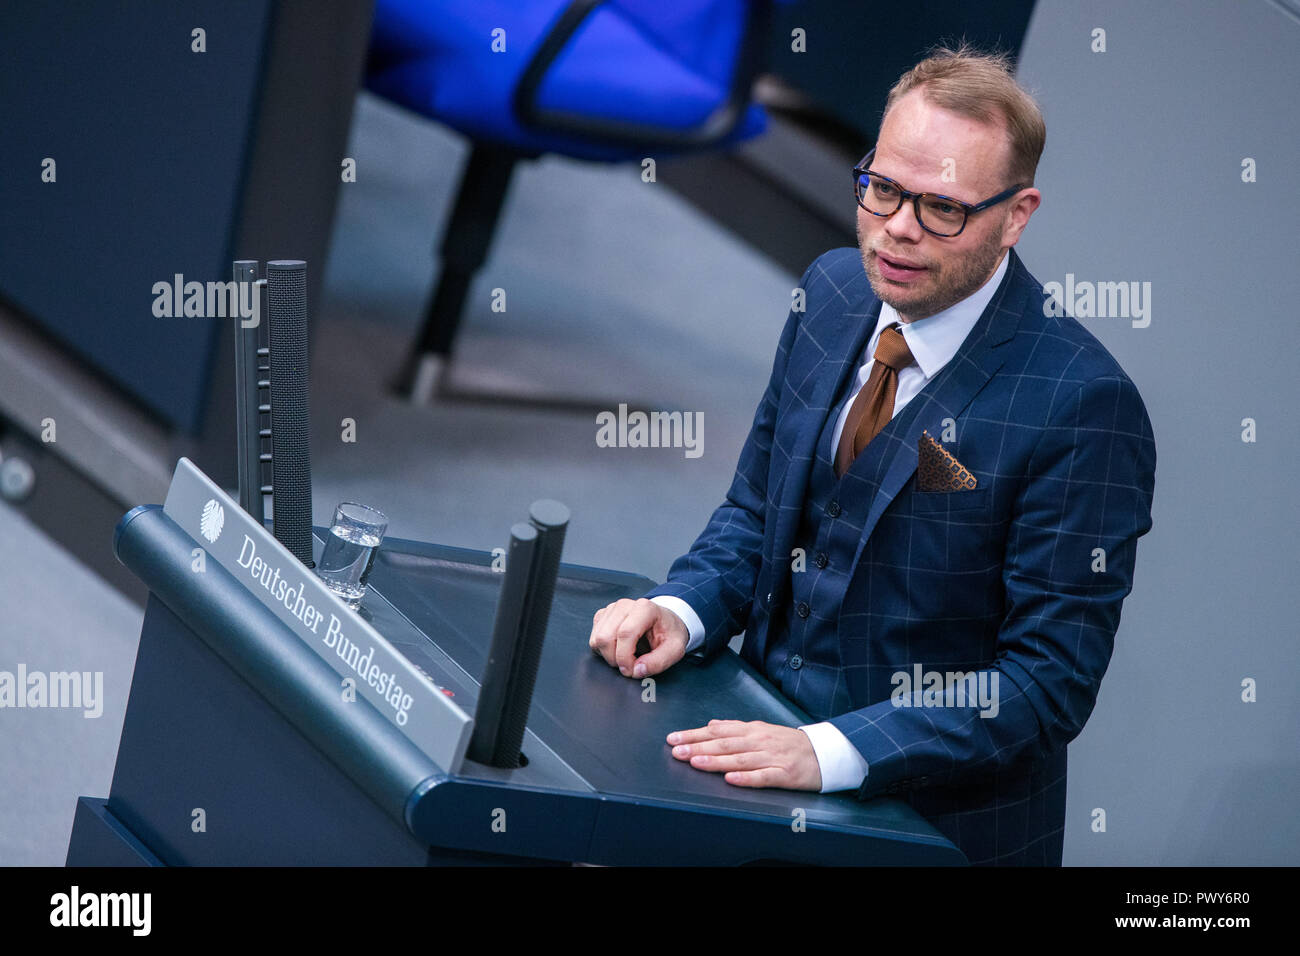 Berlin, Germany. 18th Oct, 2018. Helge Lindh, member of the Bundestag of the SPD faction, speaks in the Bundestag. Credit: Jens Büttner/dpa-Zentralbild/dpa/Alamy Live News - Stock Image